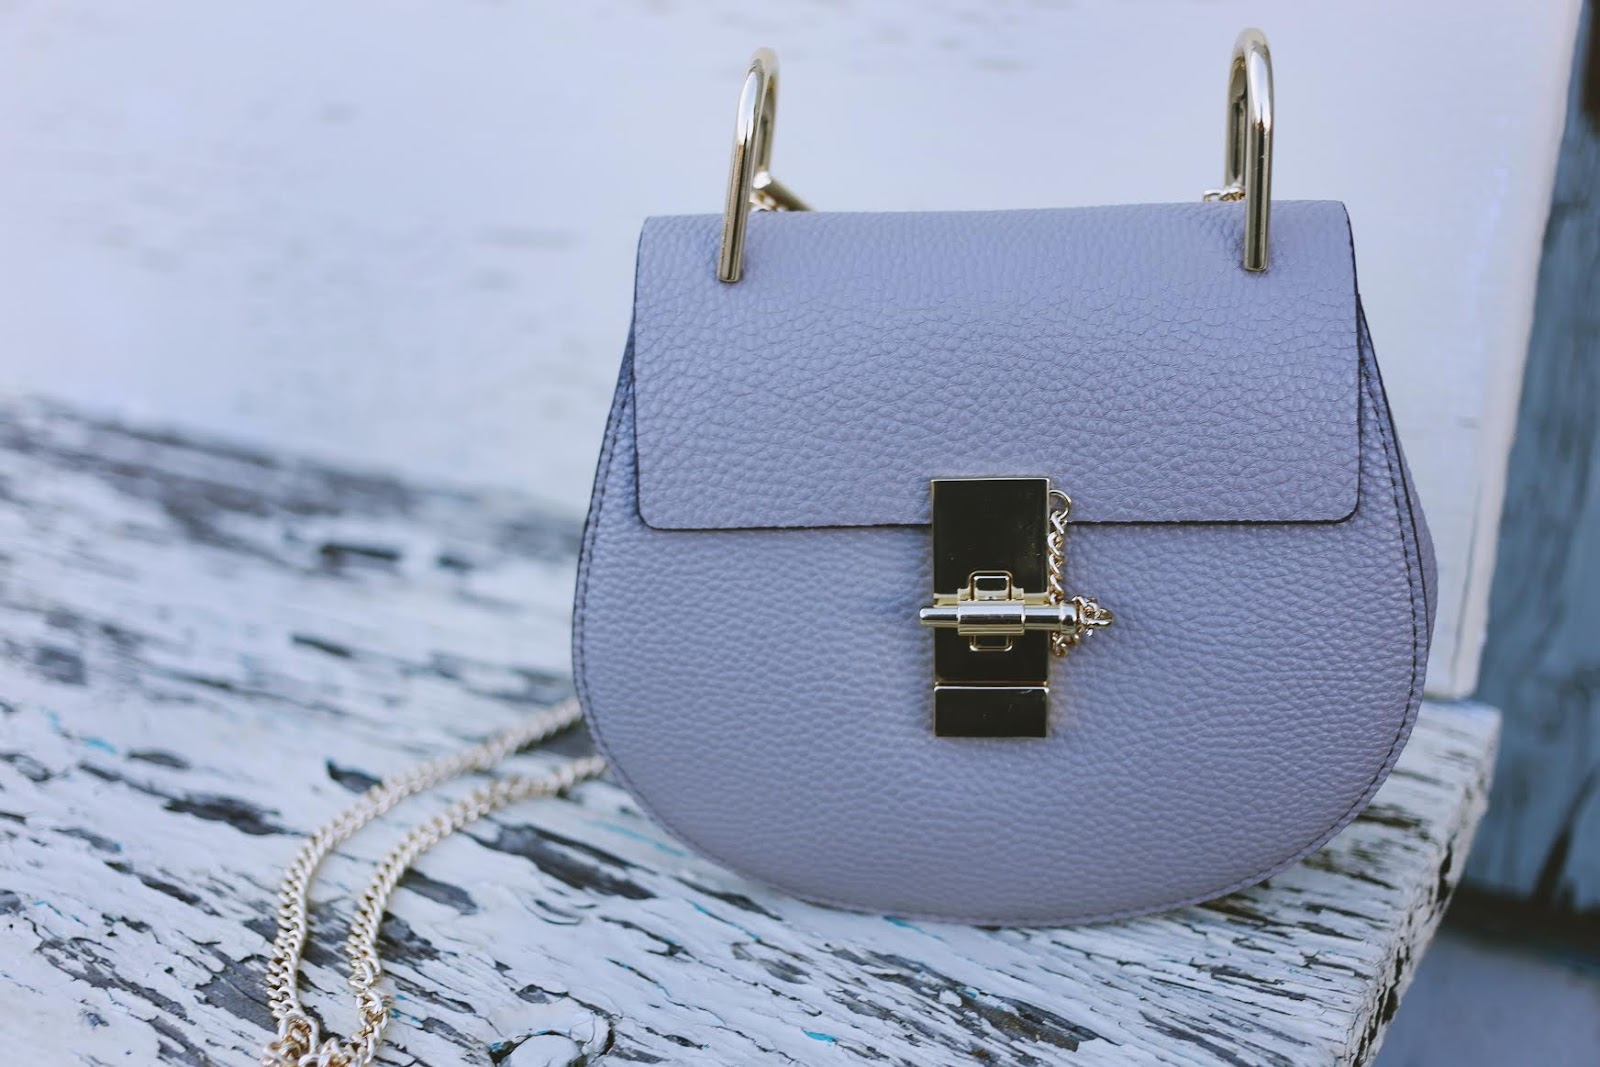 designer inspired handbags bivk  Designer Inspired Handbags